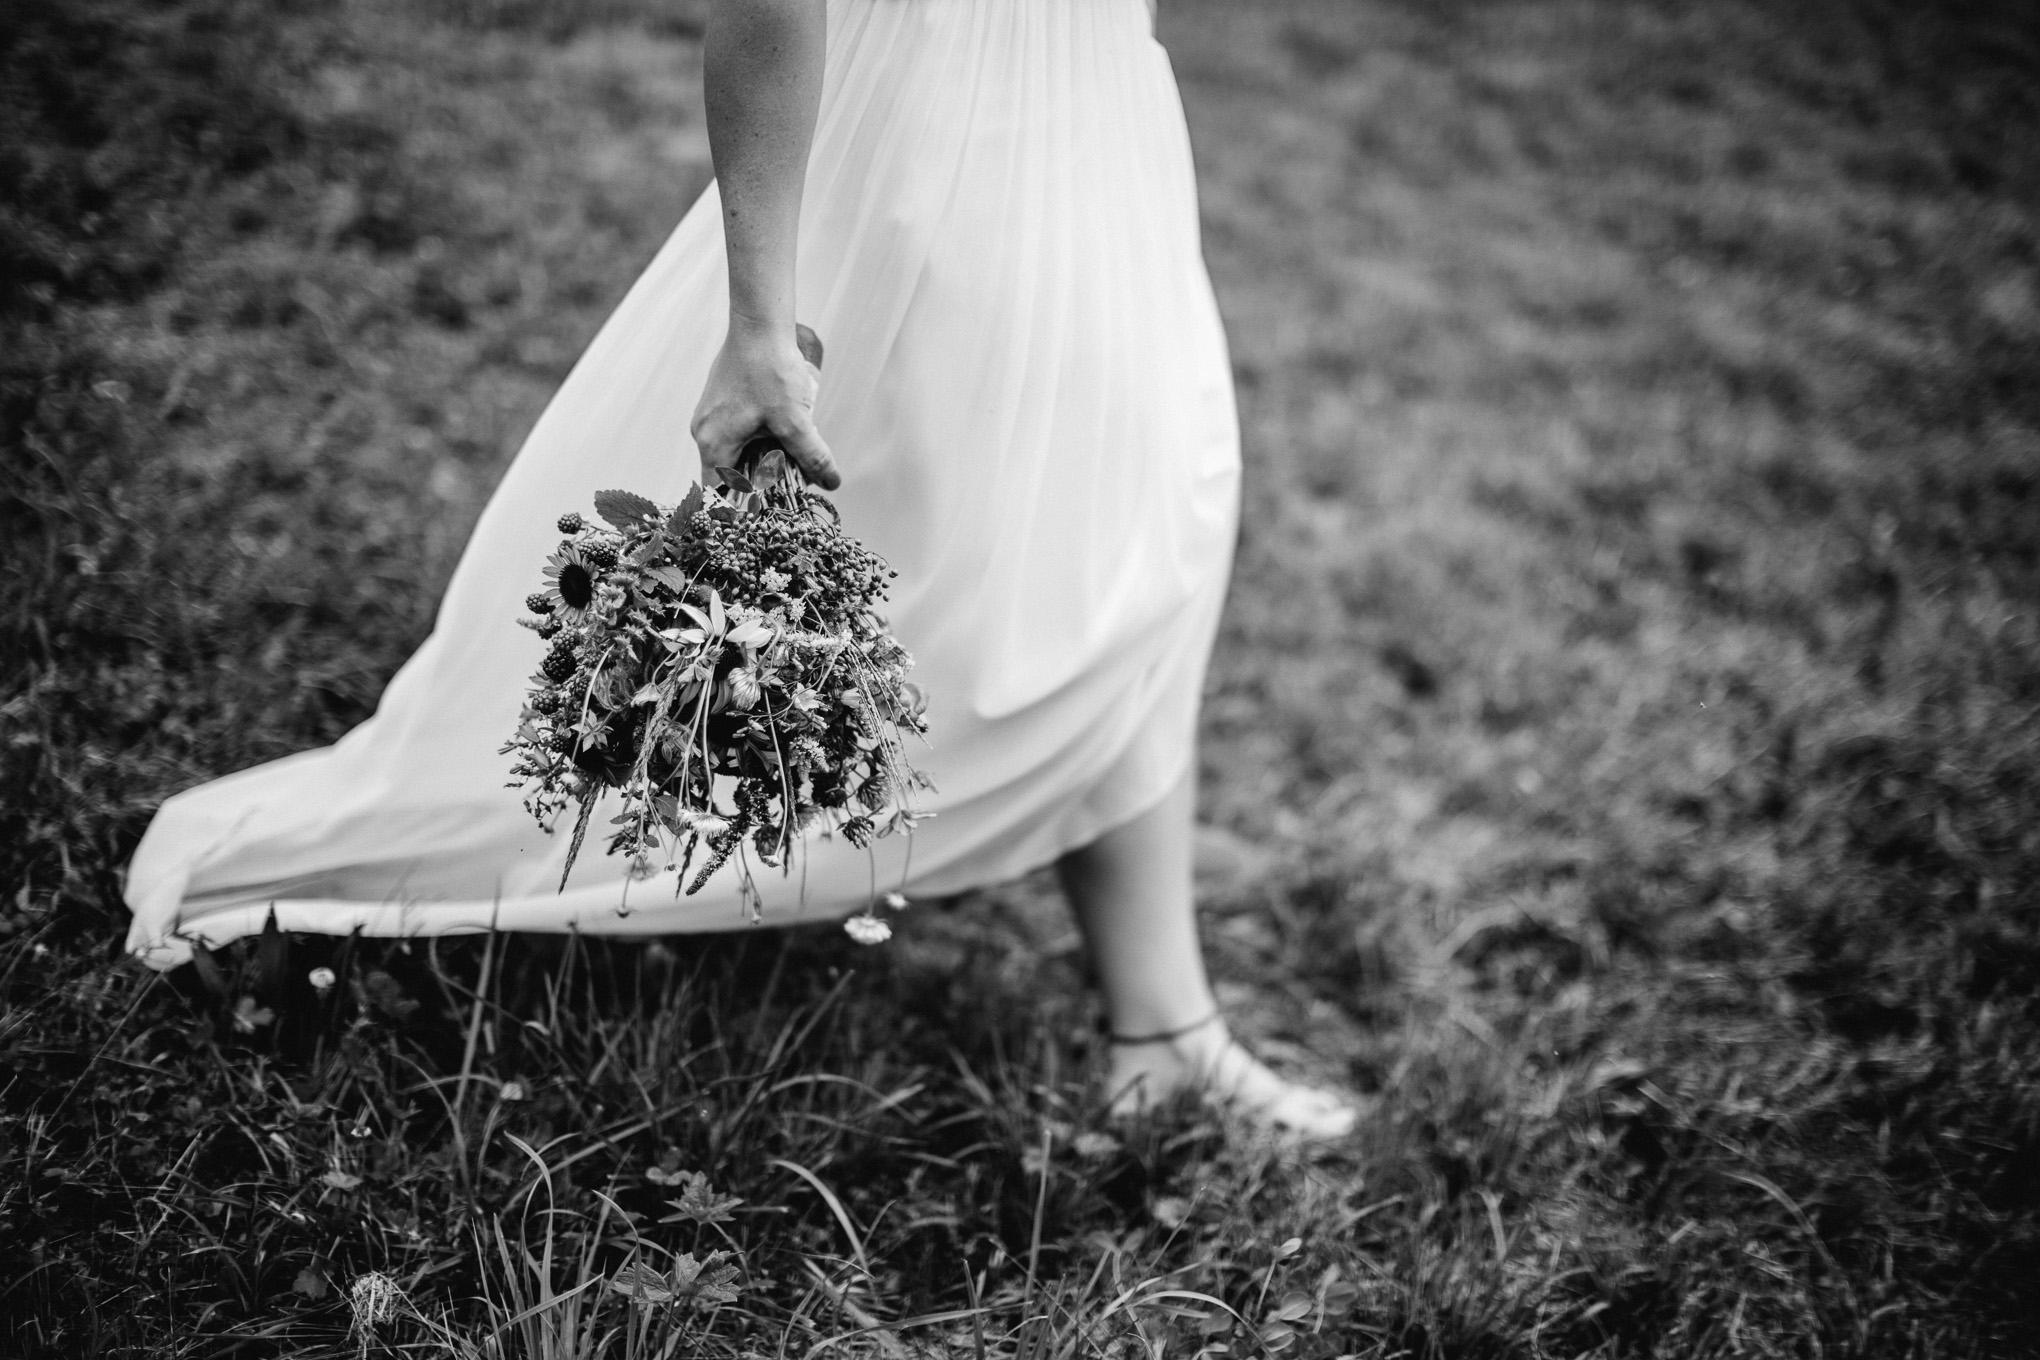 Boho-Scheune-Bauern-Hochzeit-Lörrach-Rheinfelden-Pia-Anna-Christian-Photography-NC-13.jpg